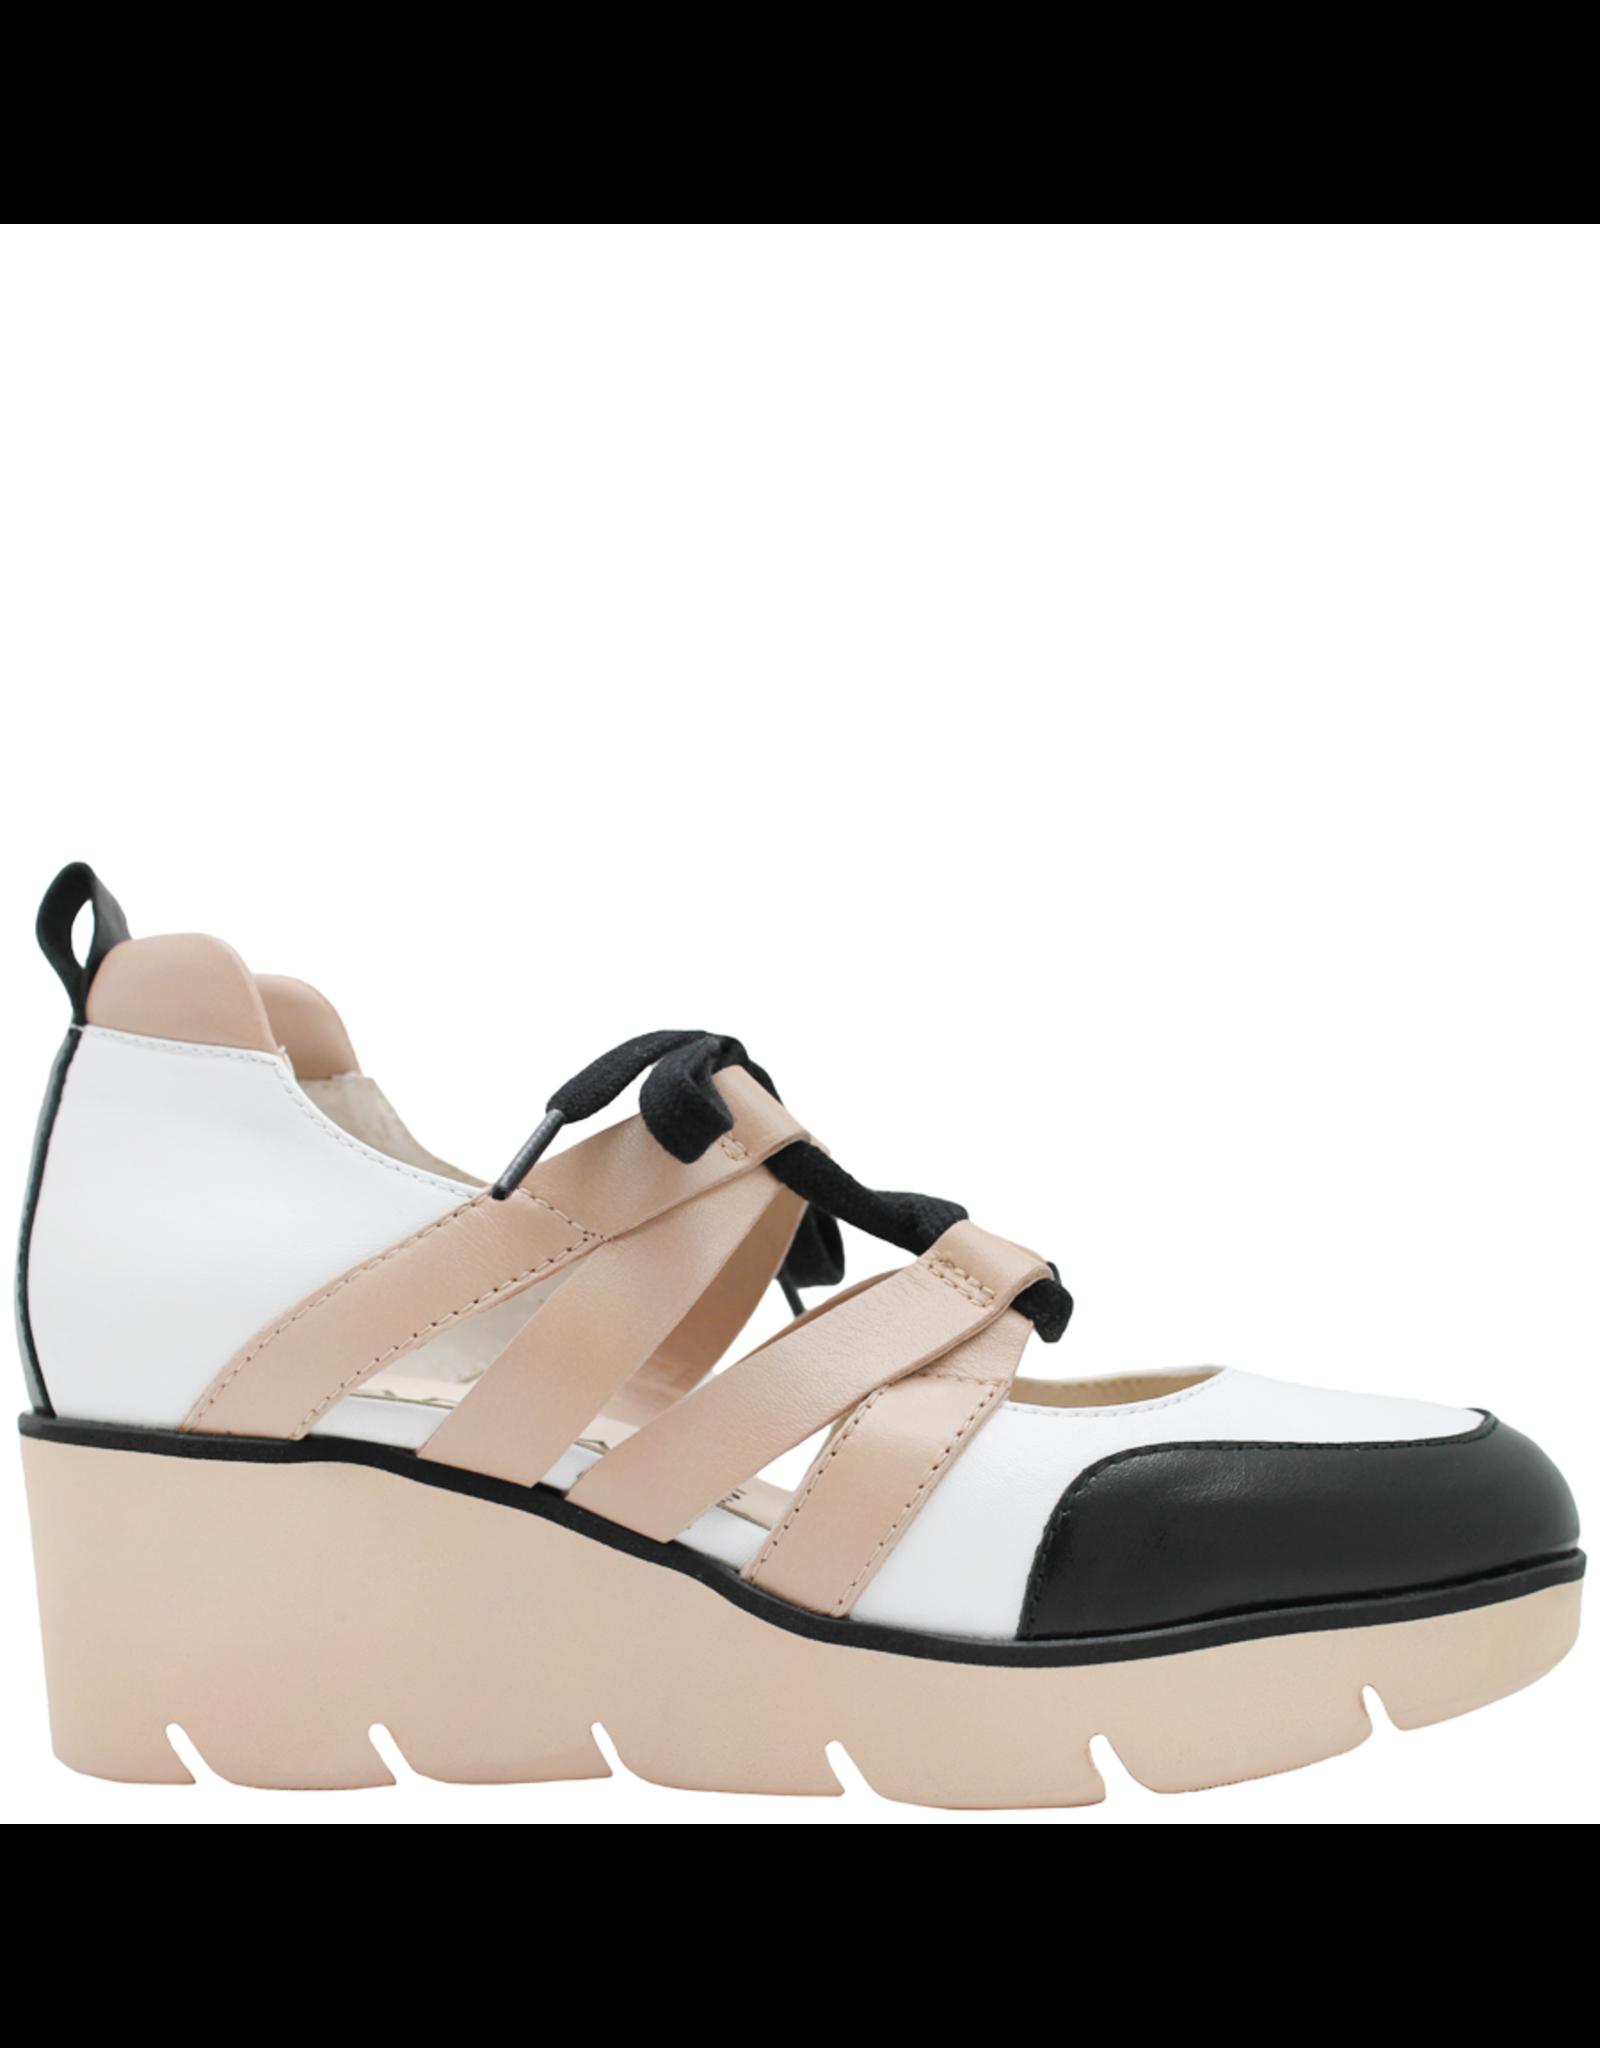 Gadea Gadea Black White Natural Closed Toe Lace-Up Sandal 1082